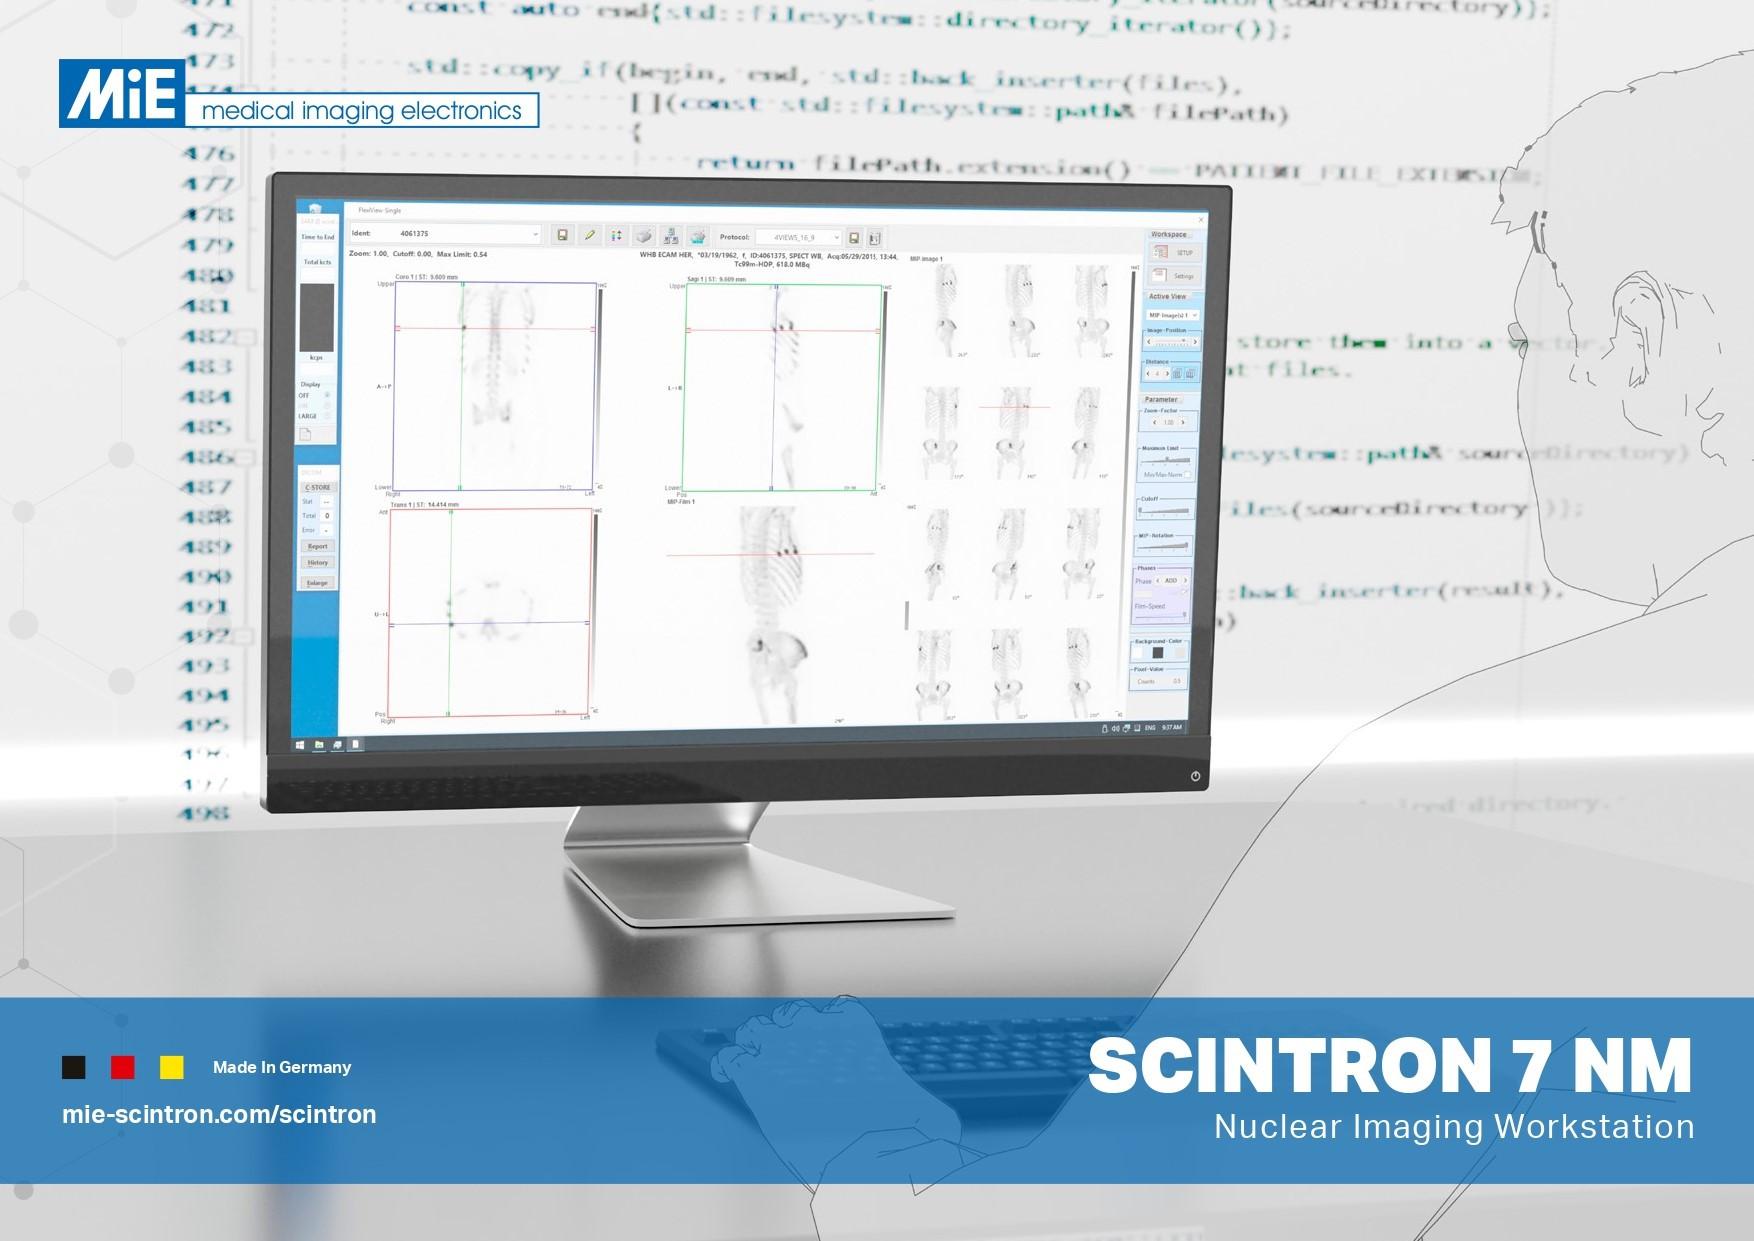 Scintron Workstation